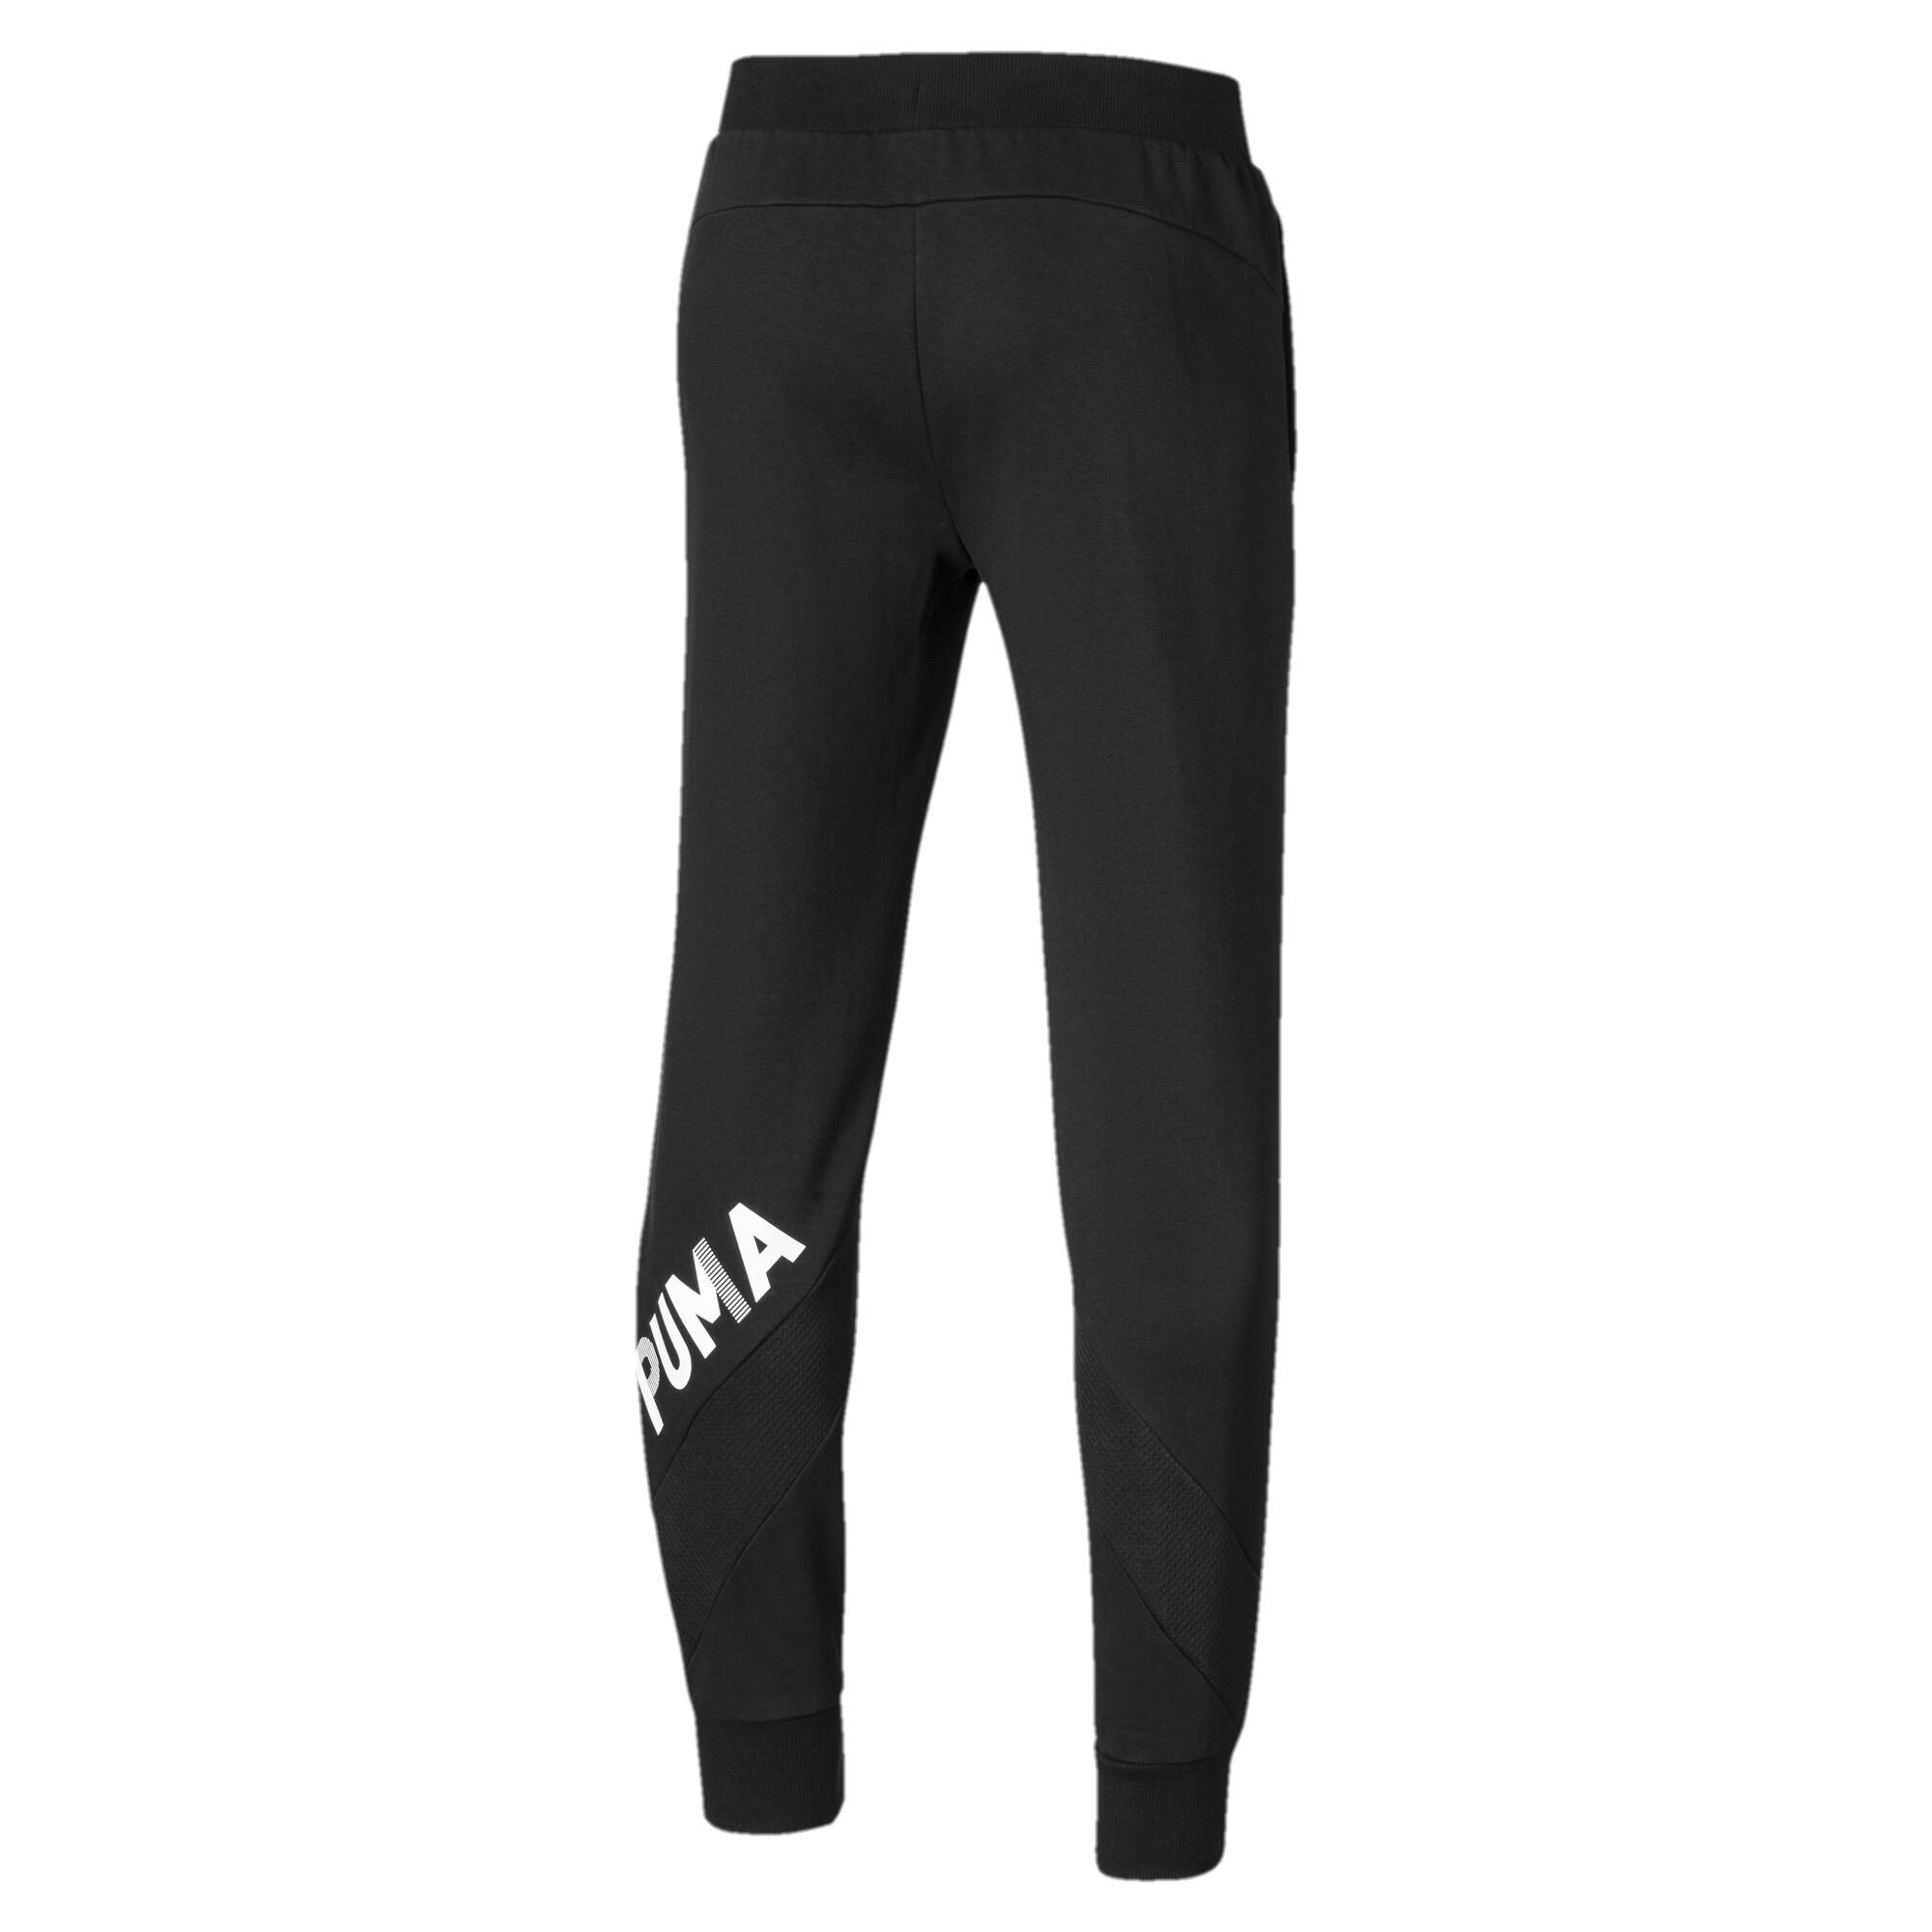 PUMA-Modern-Sports-Men-039-s-Sweatpants-Men-Knitted-Pants-Basics thumbnail 8